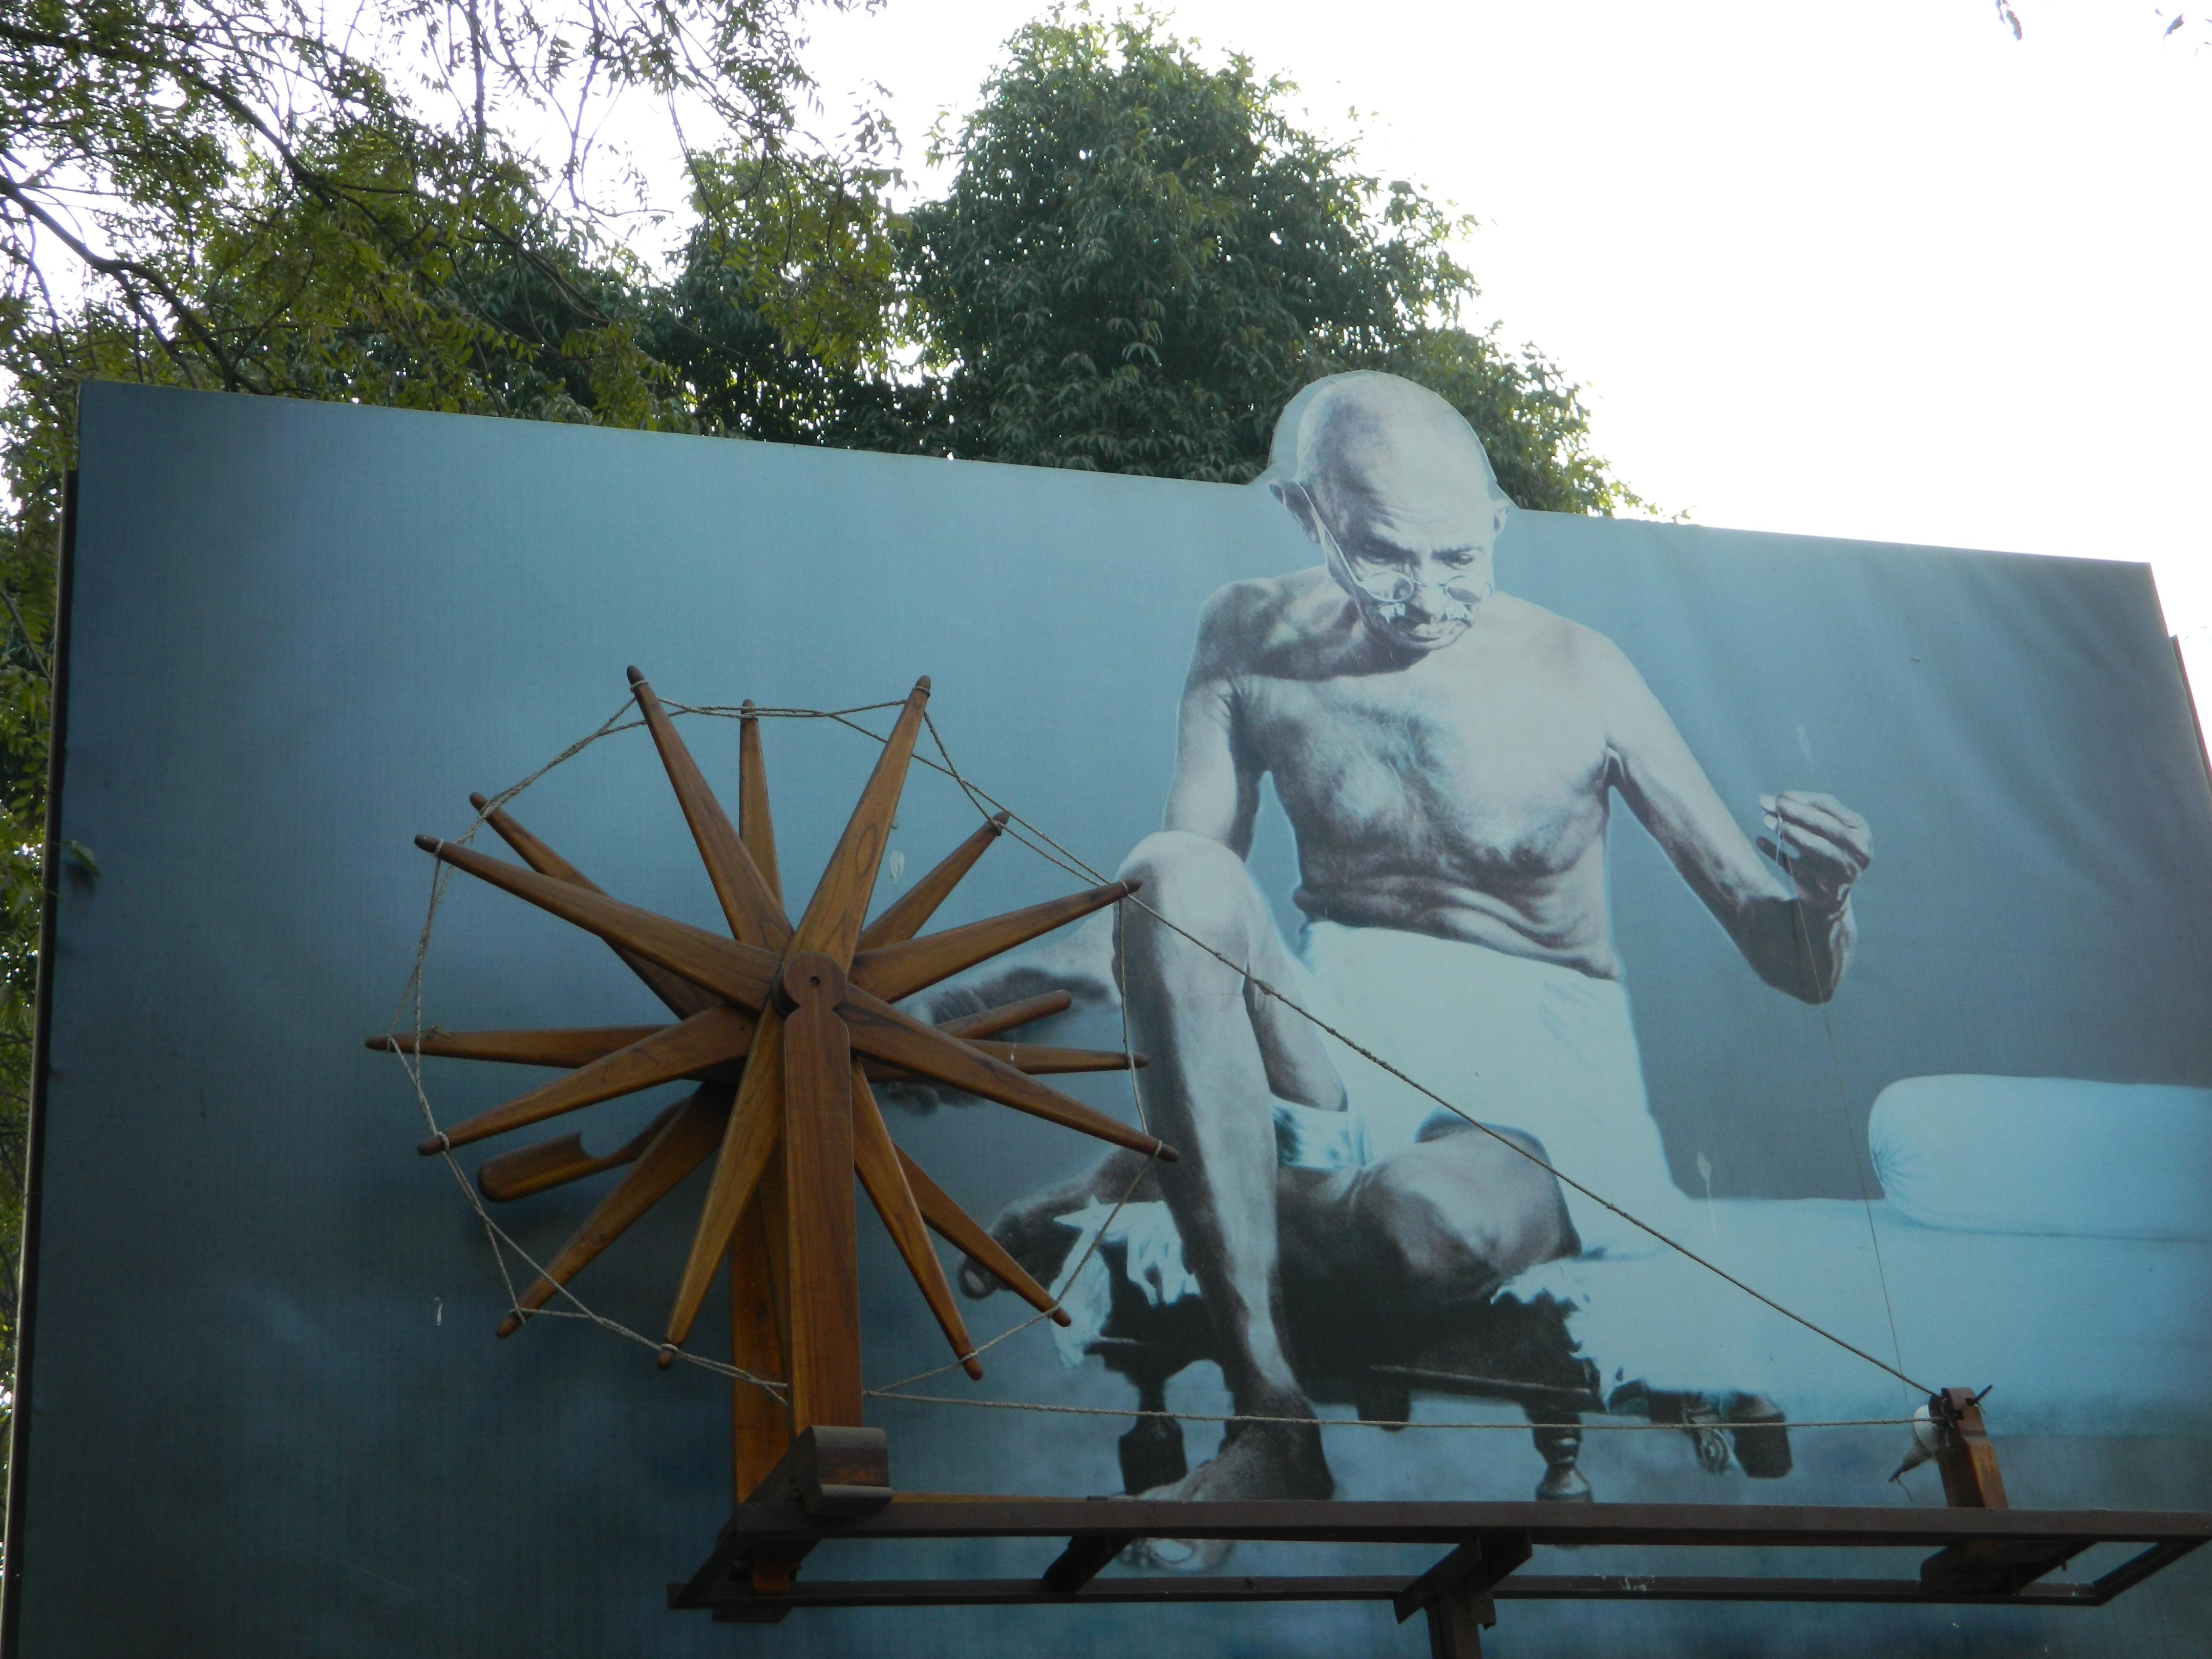 File:Charkha at Gandhi Ashram jpg - Wikimedia Commons